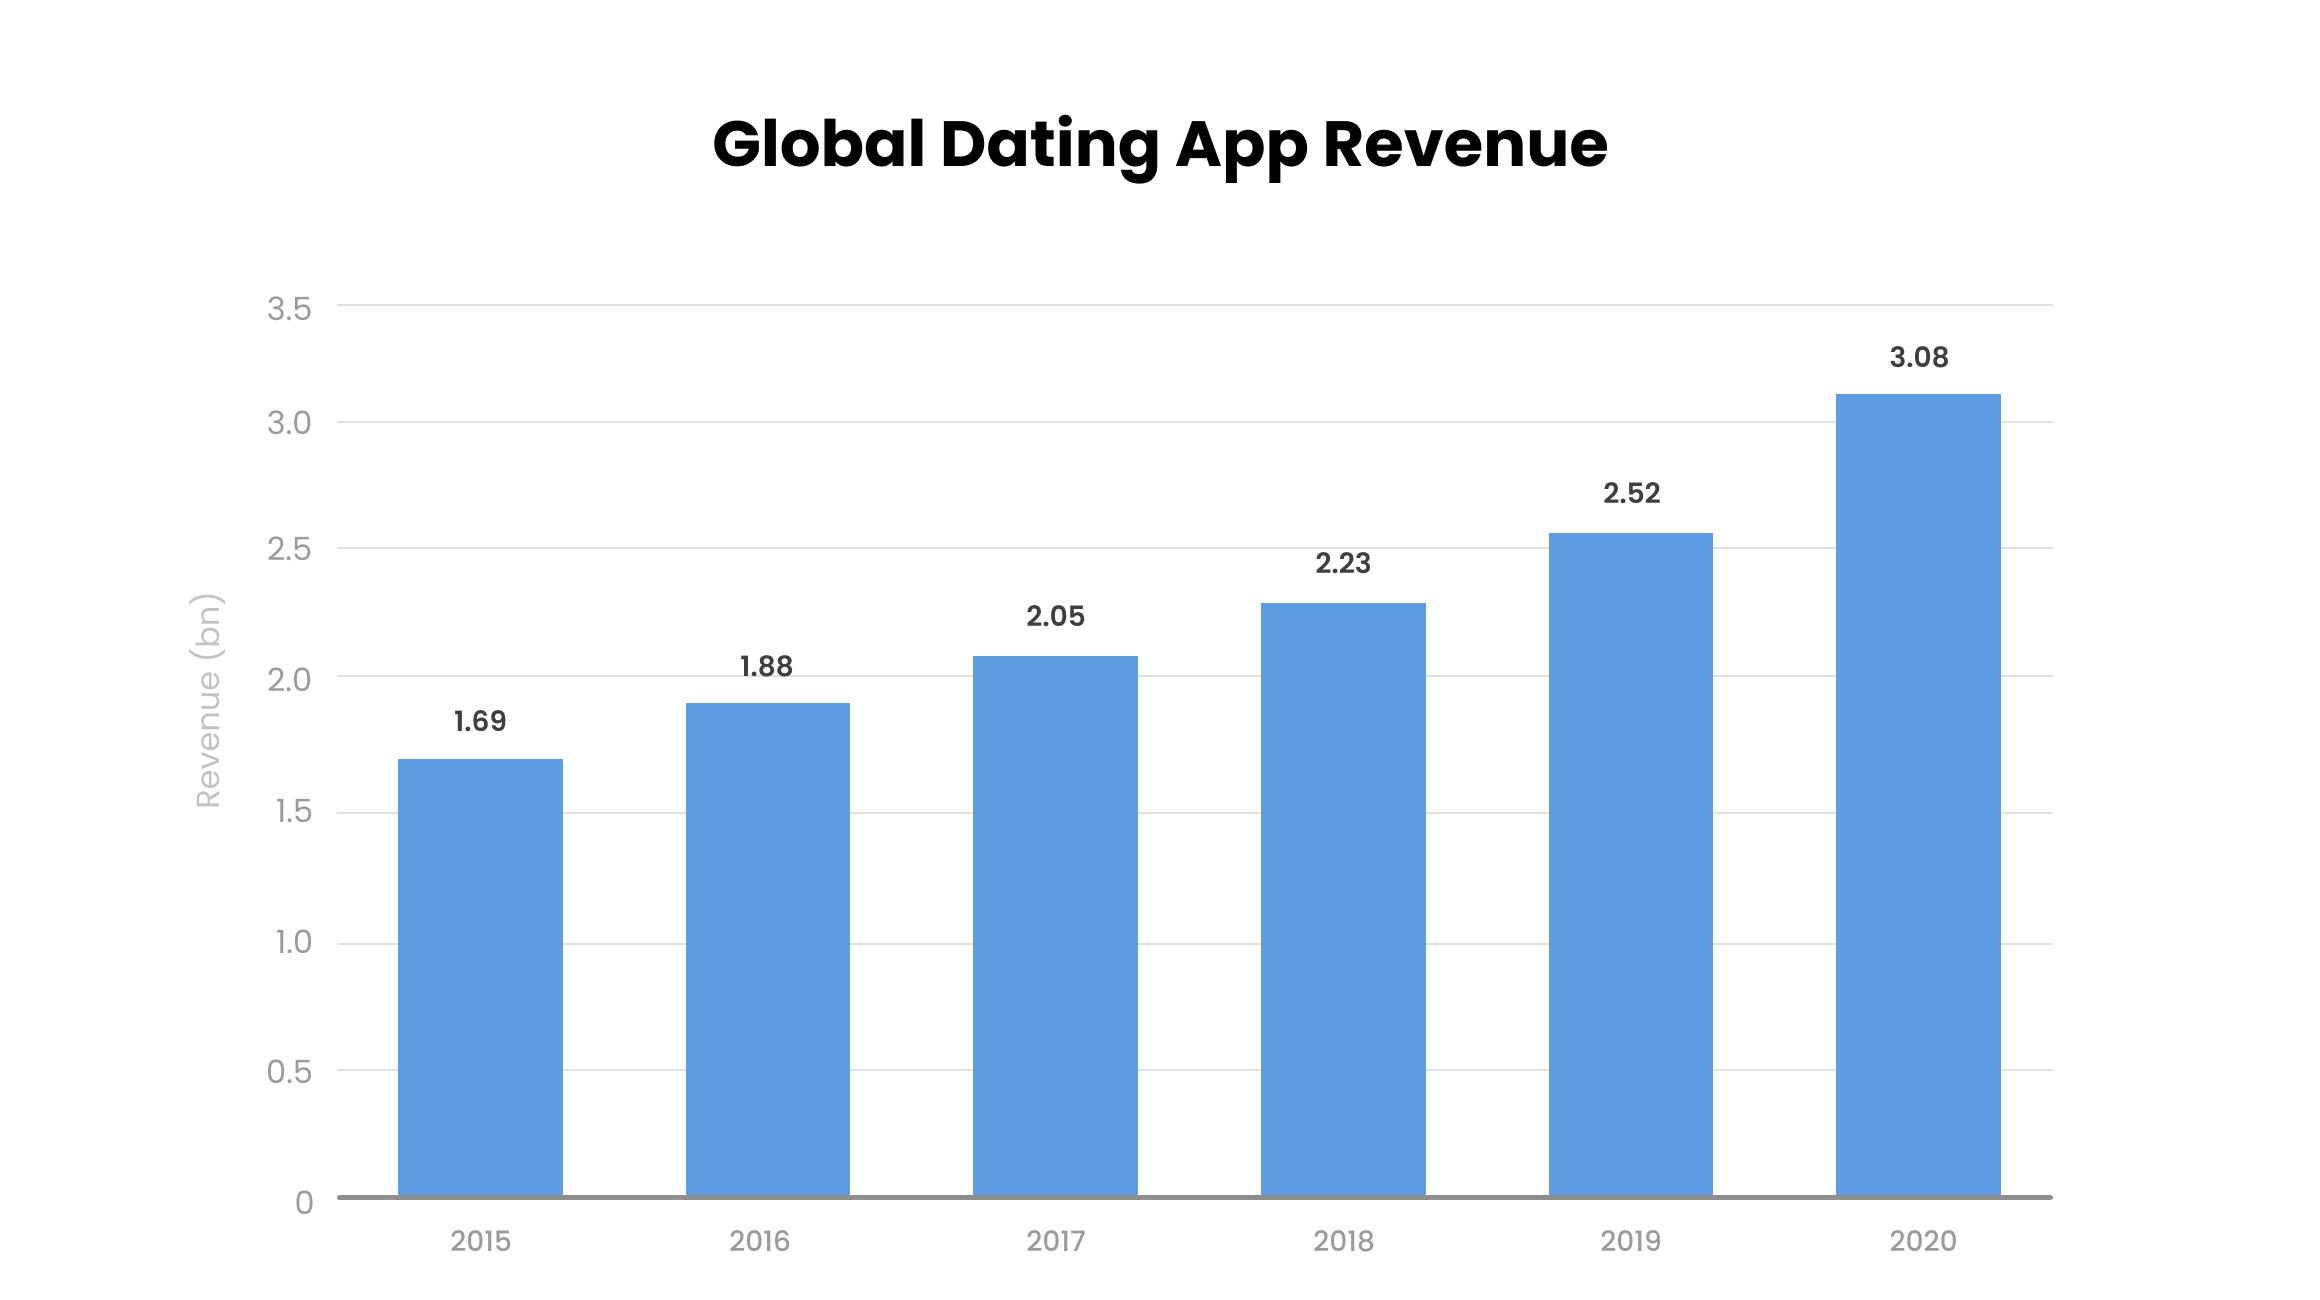 https://images.ctfassets.net/0nm5vlv2ad7a/1p4IeVSD08VaFHKBbip8Wb/b026743c2dc679b9168812e5c54b9c93/global_dating_app_revenue.png